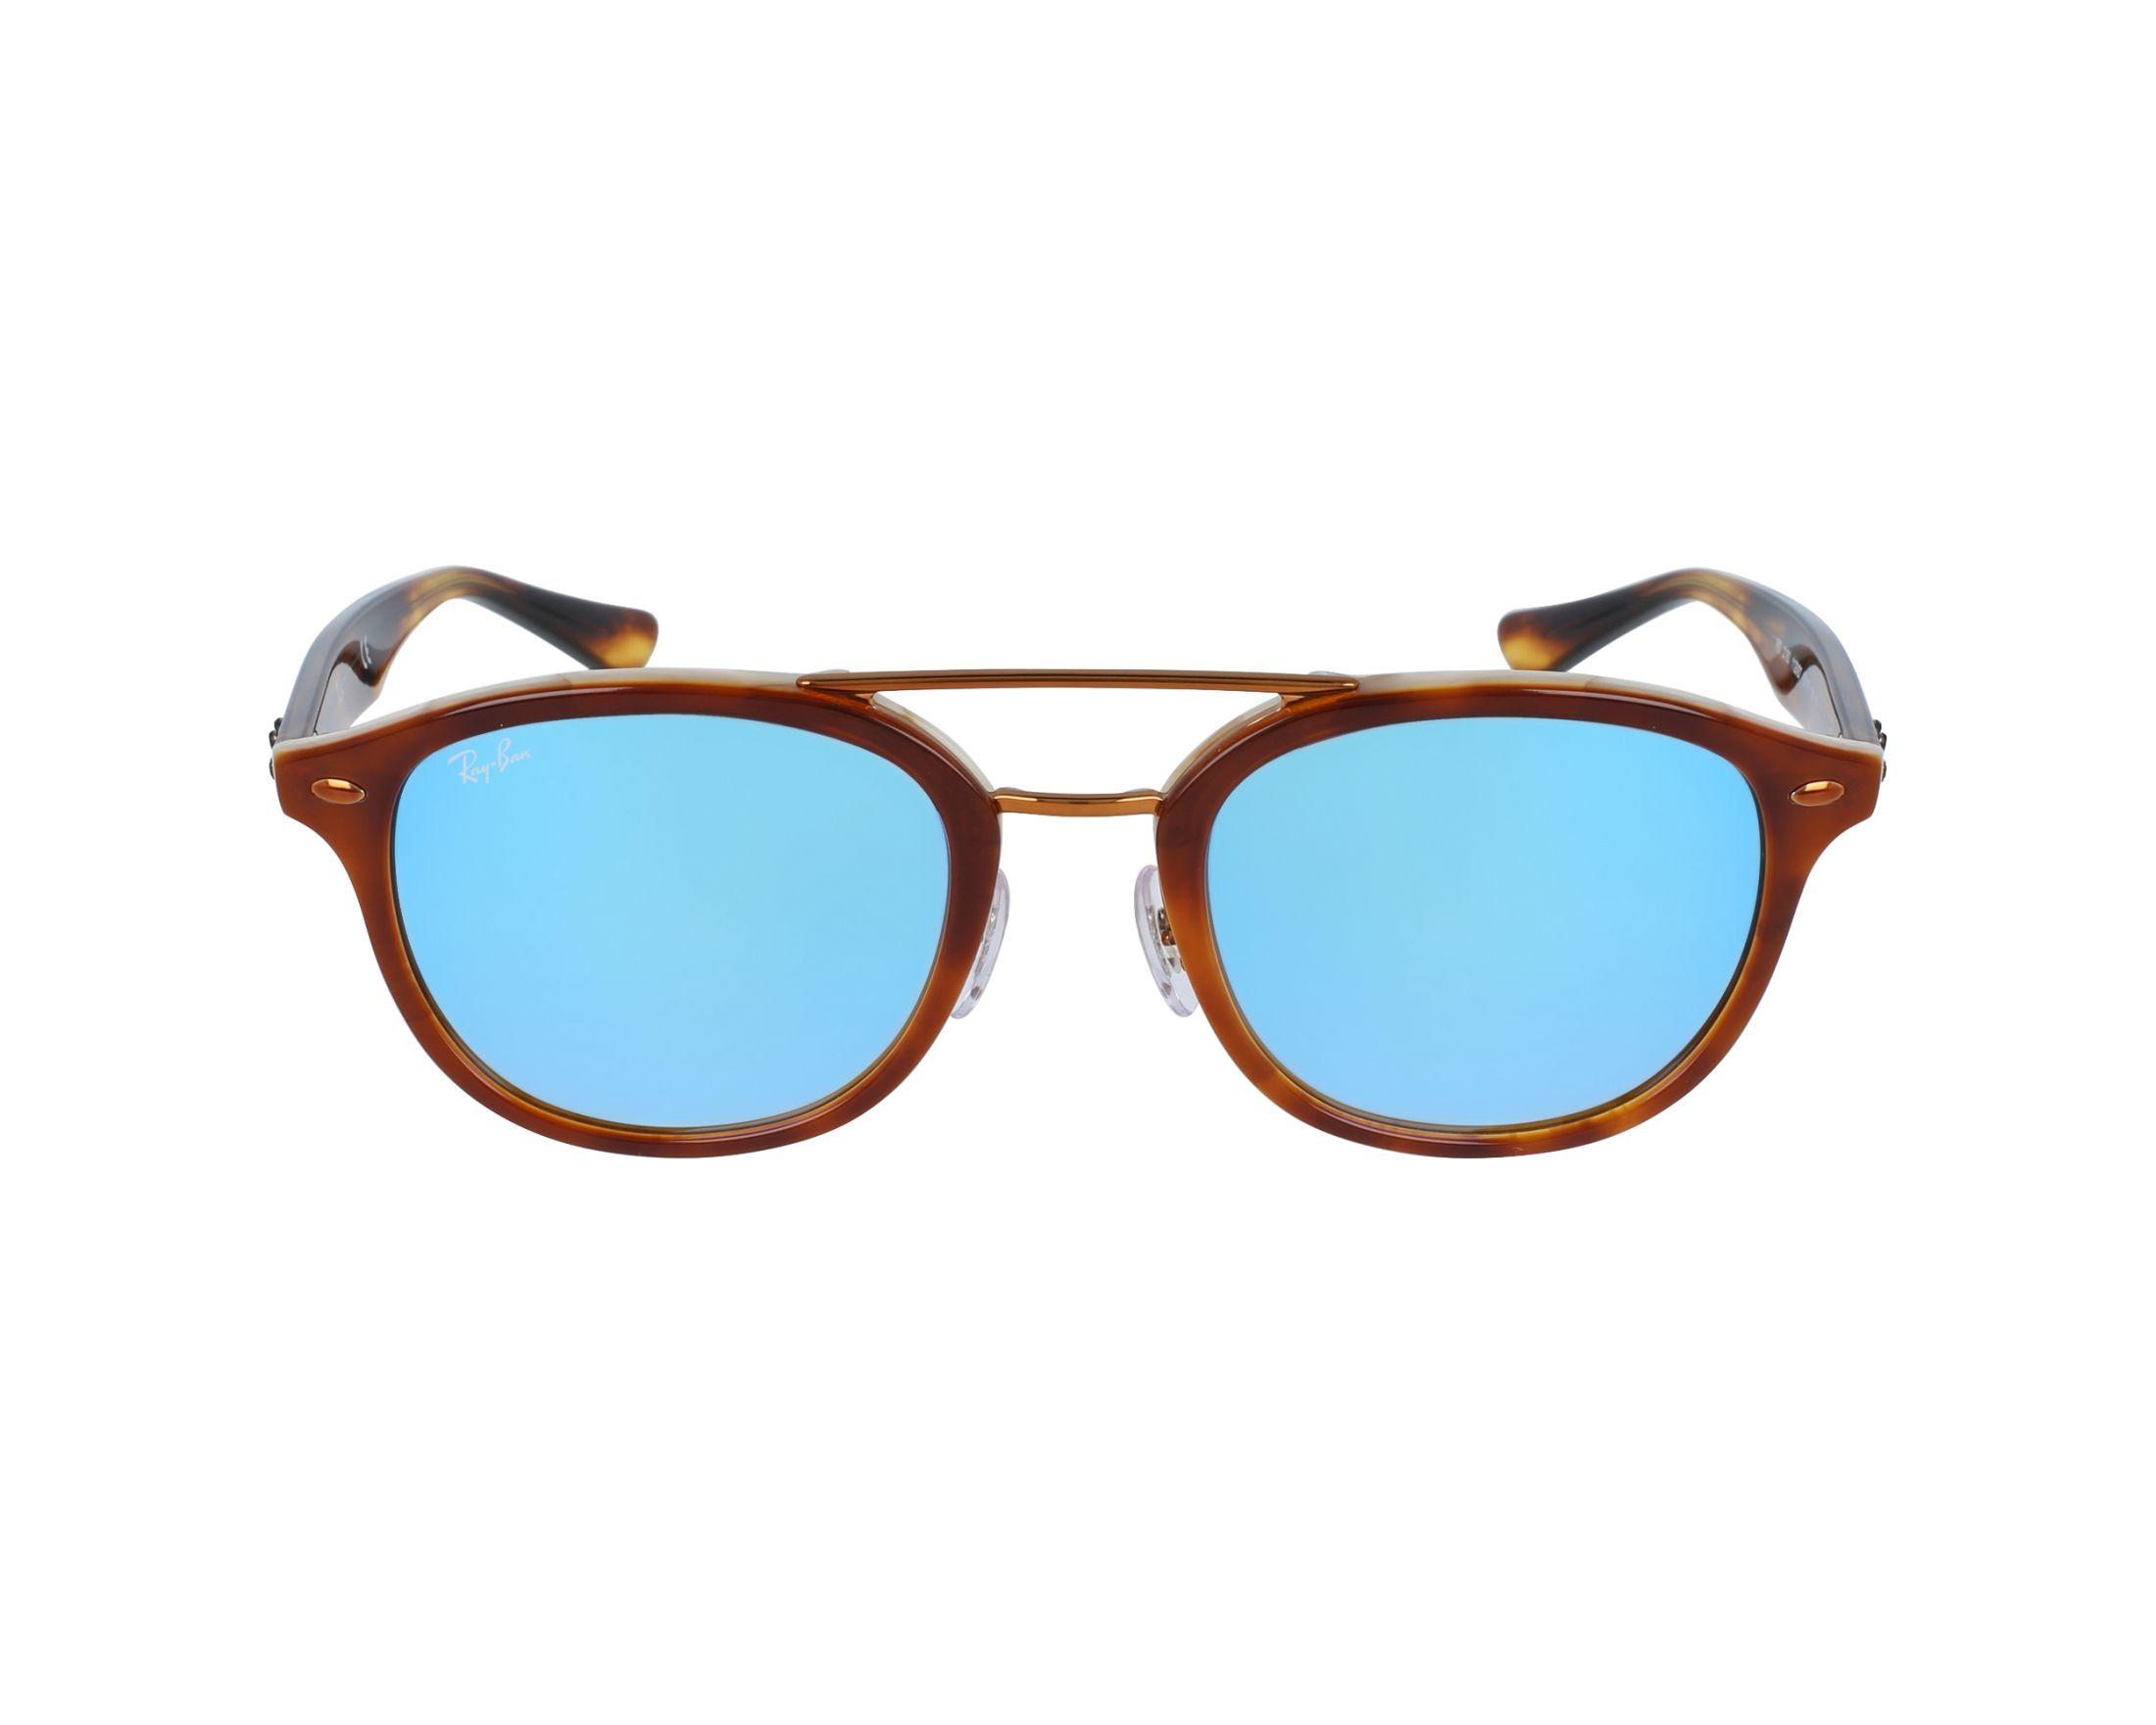 23f92c424e Sunglasses Ray-Ban RB-2183 1128B7 - Brown Havana profile view